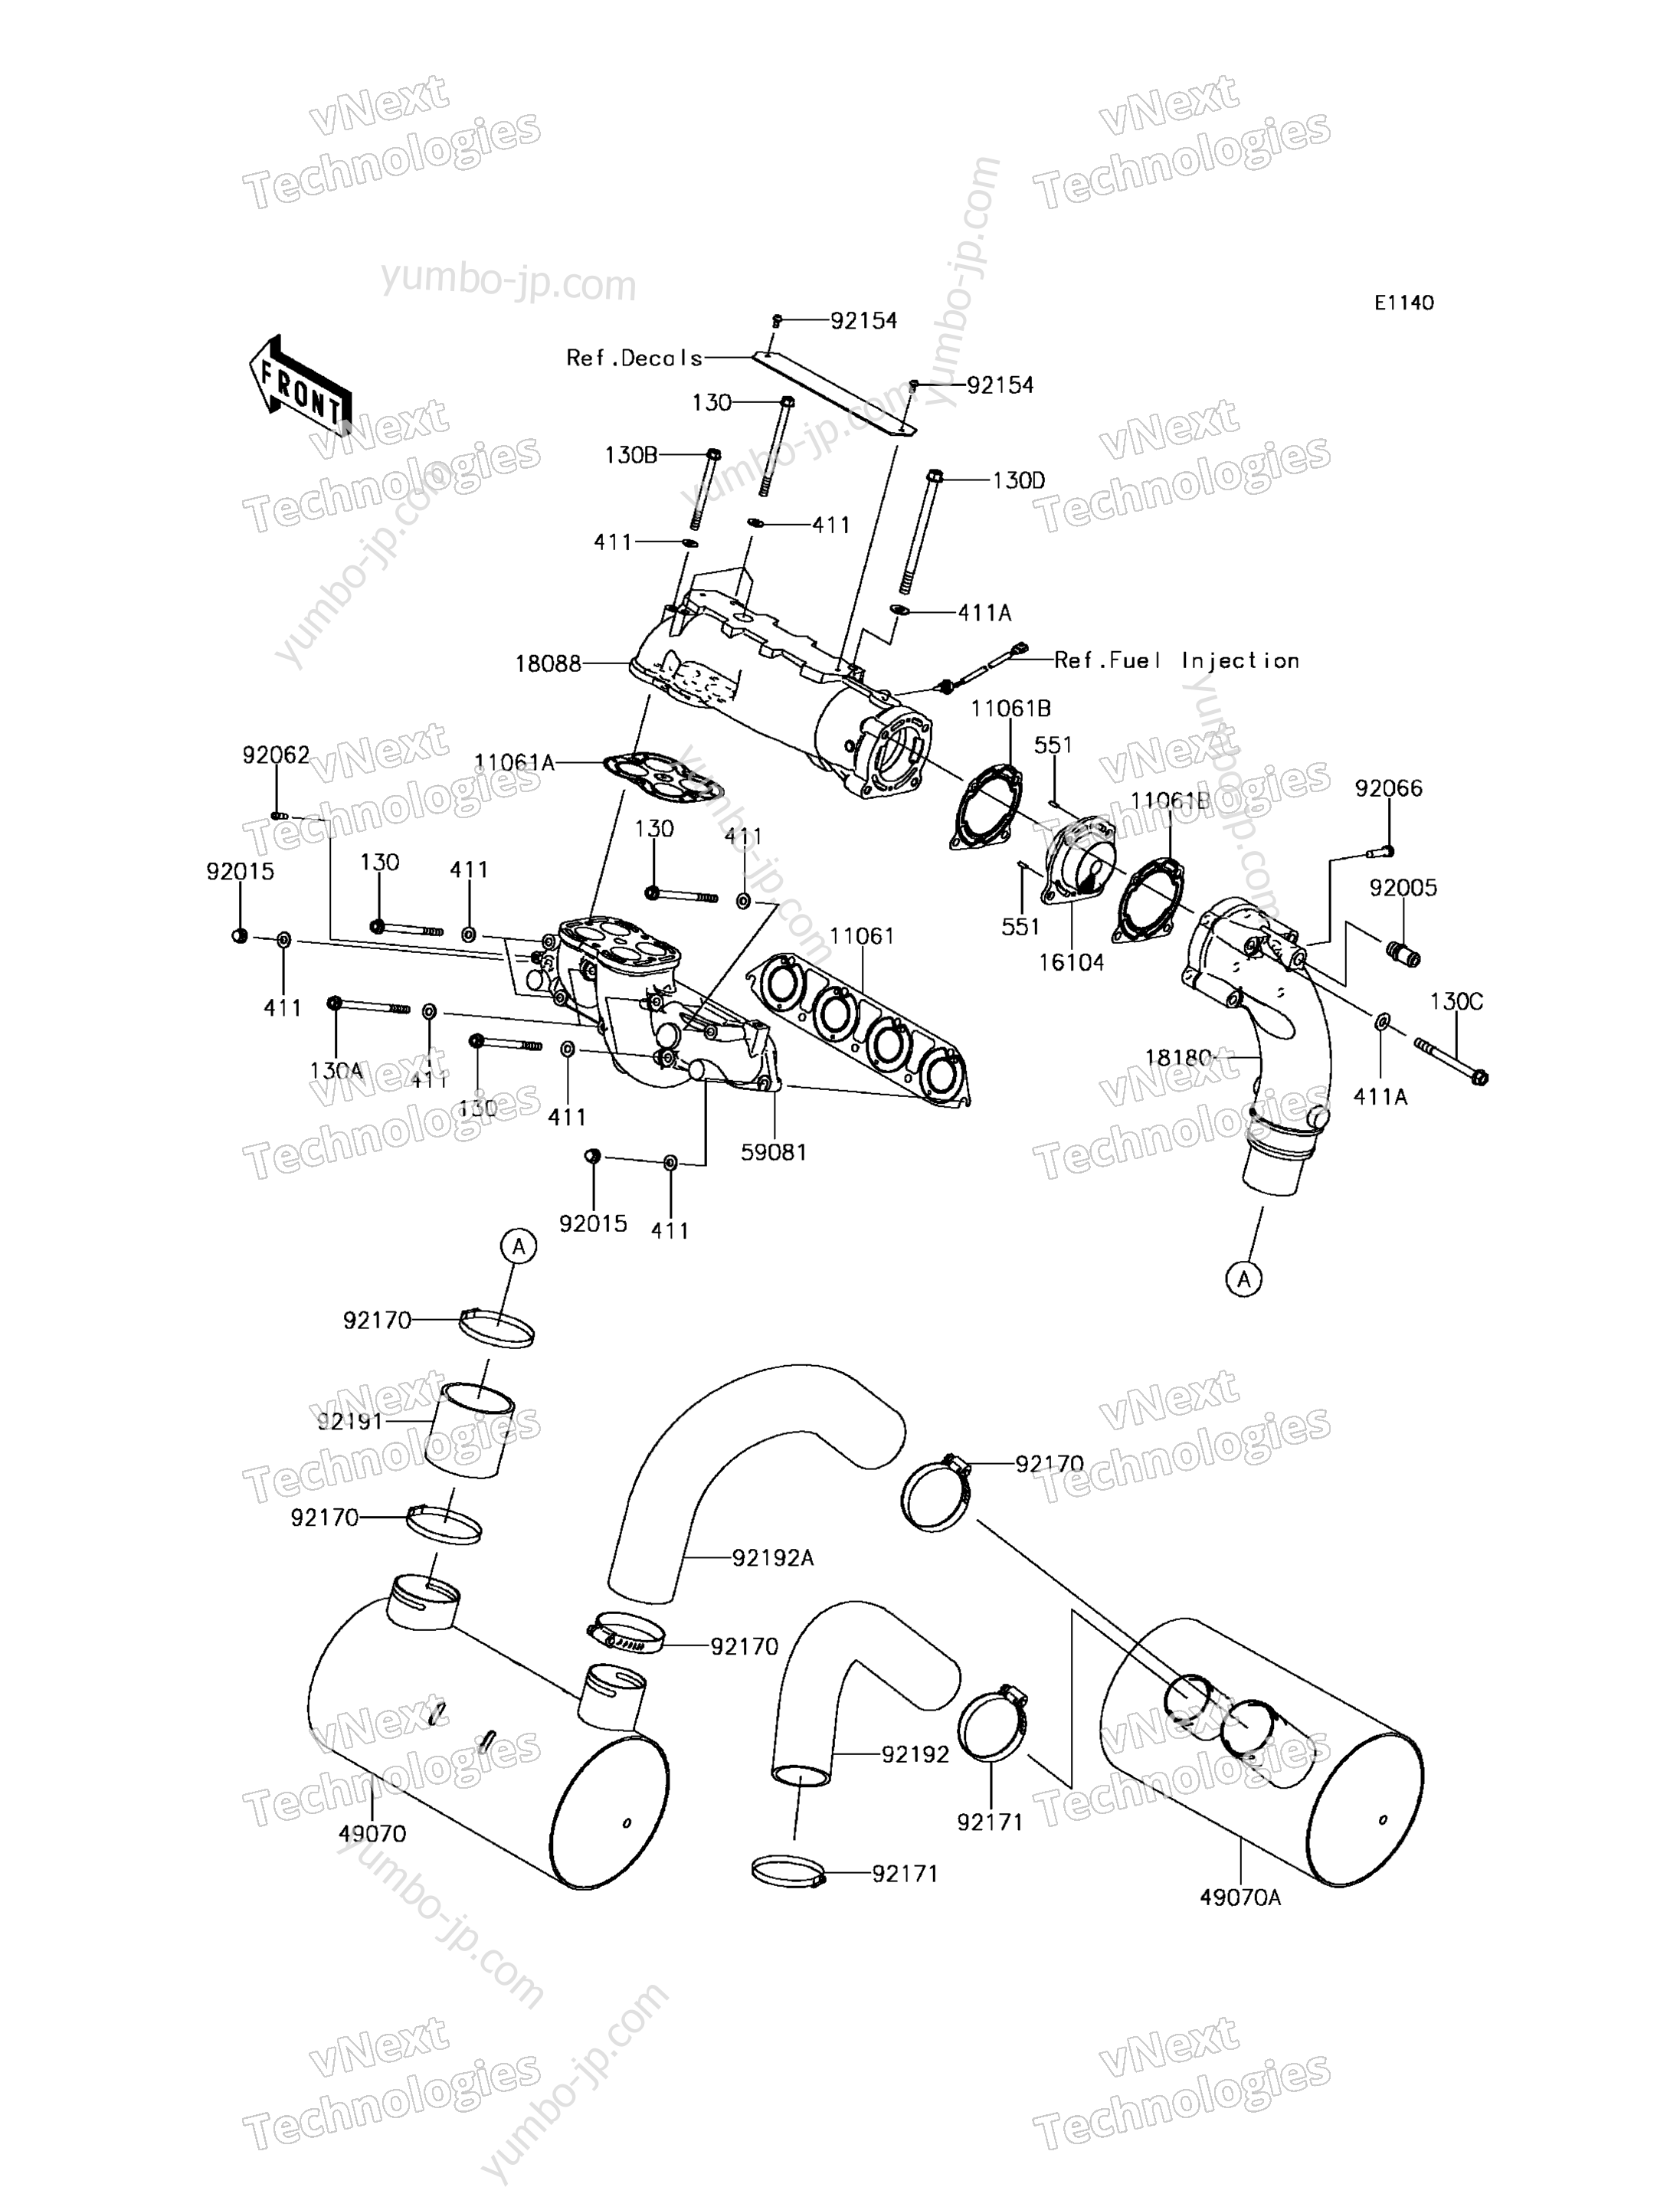 Muffler(s) для гидроцикла KAWASAKI JET SKI ULTRA 310X (JT1500PGF) 2016 г.